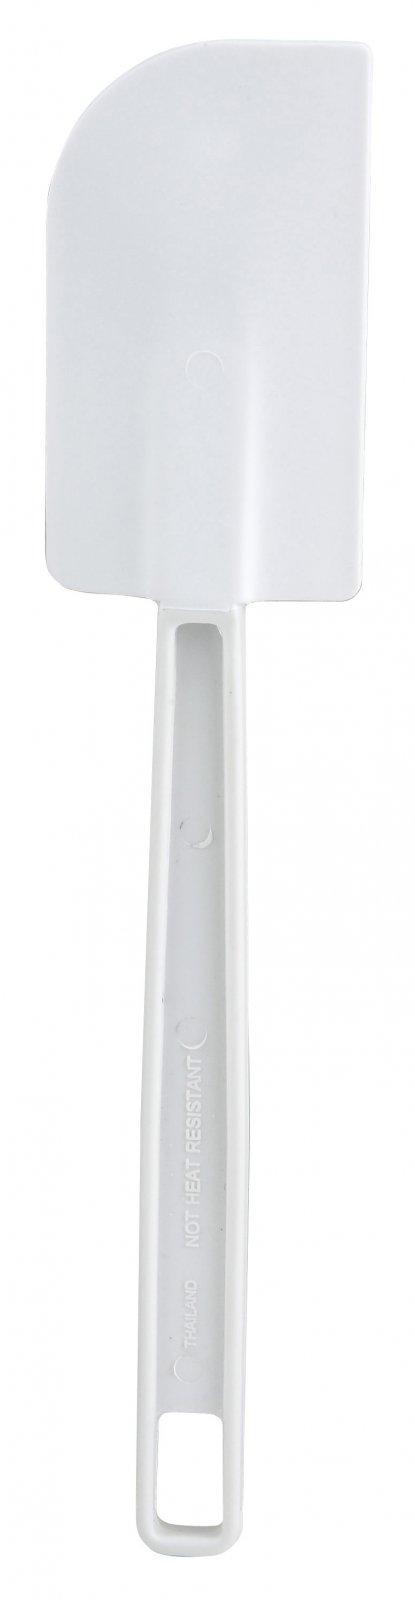 10 Plastic Scraper, Flat Blade